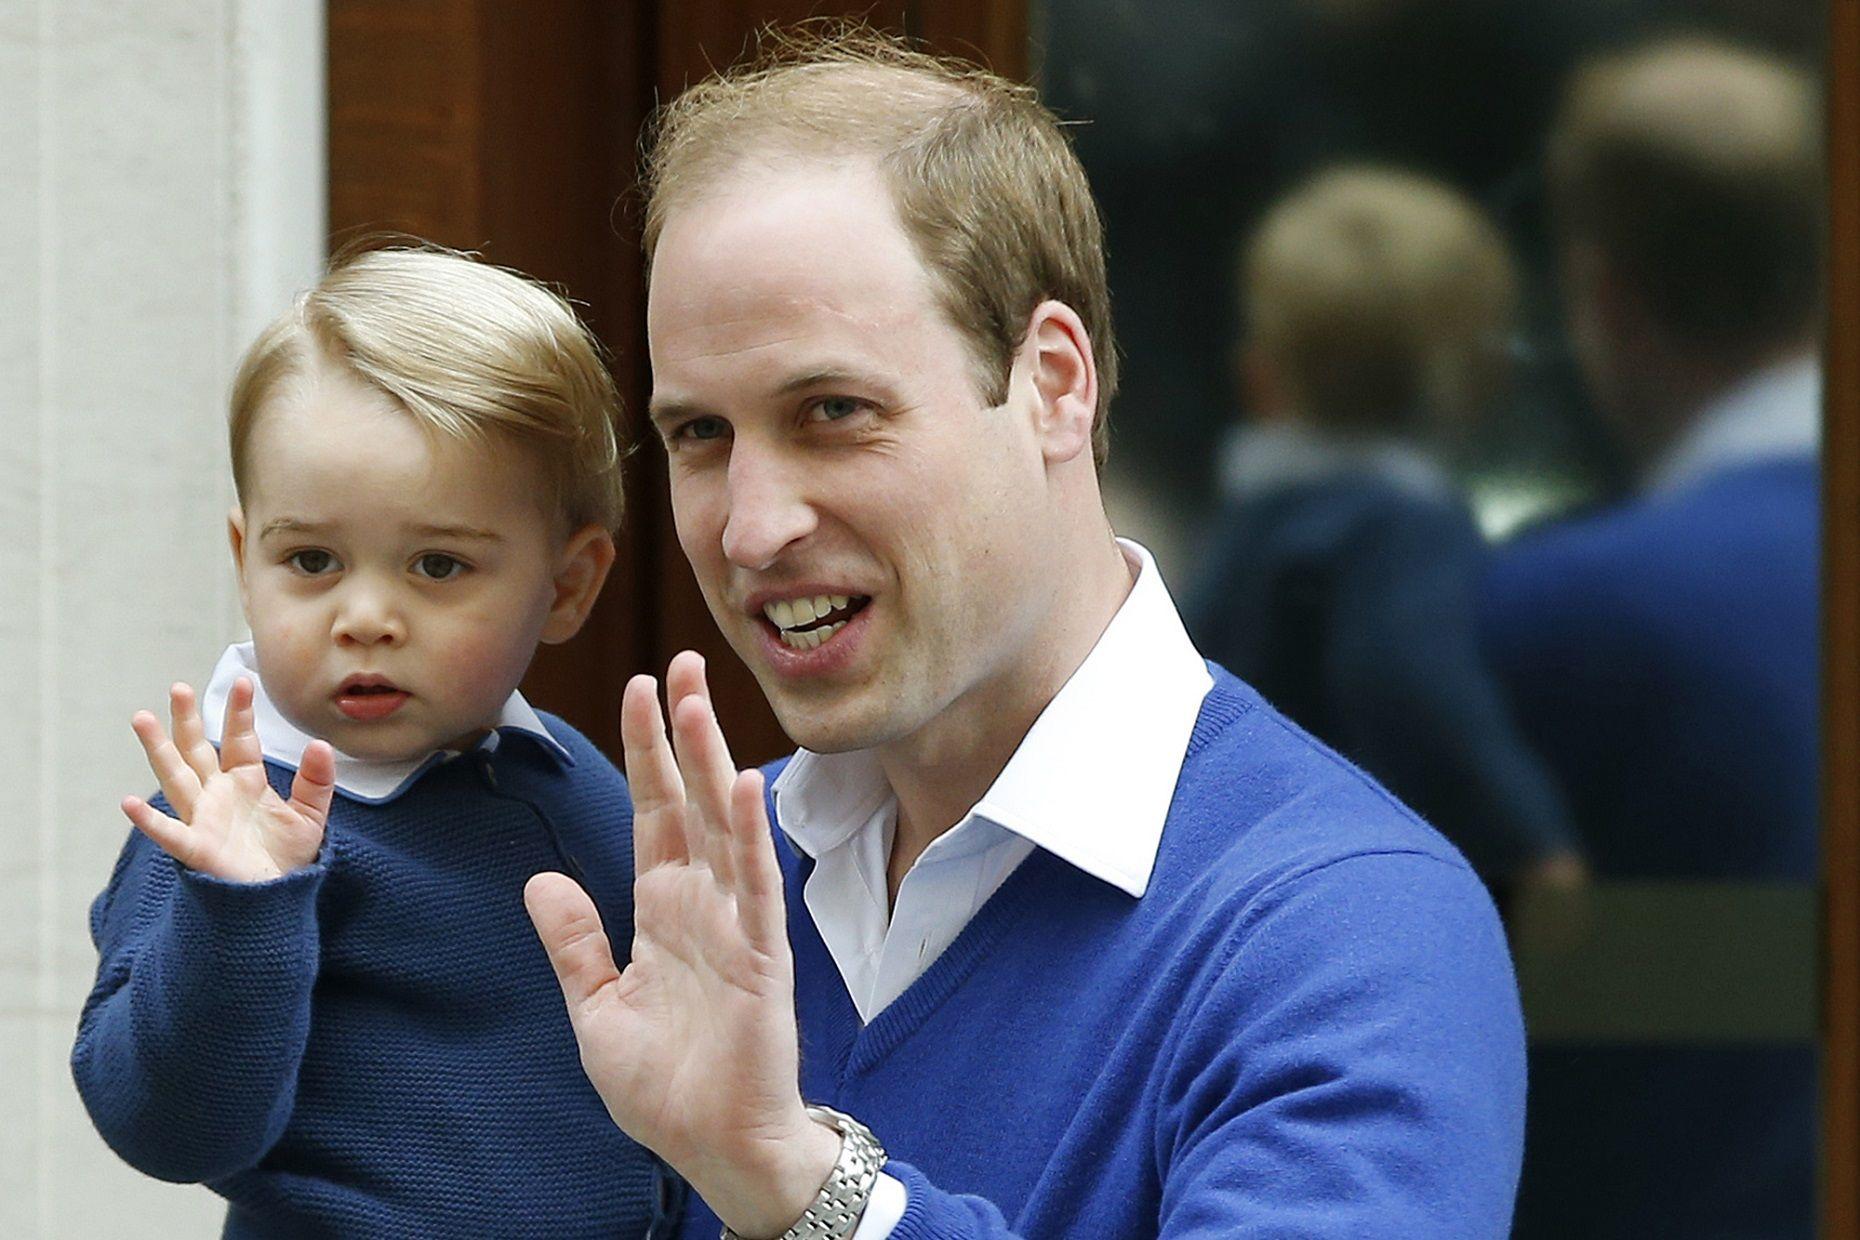 I'm very happy: Prince William - Alastair Grant/AP Photo